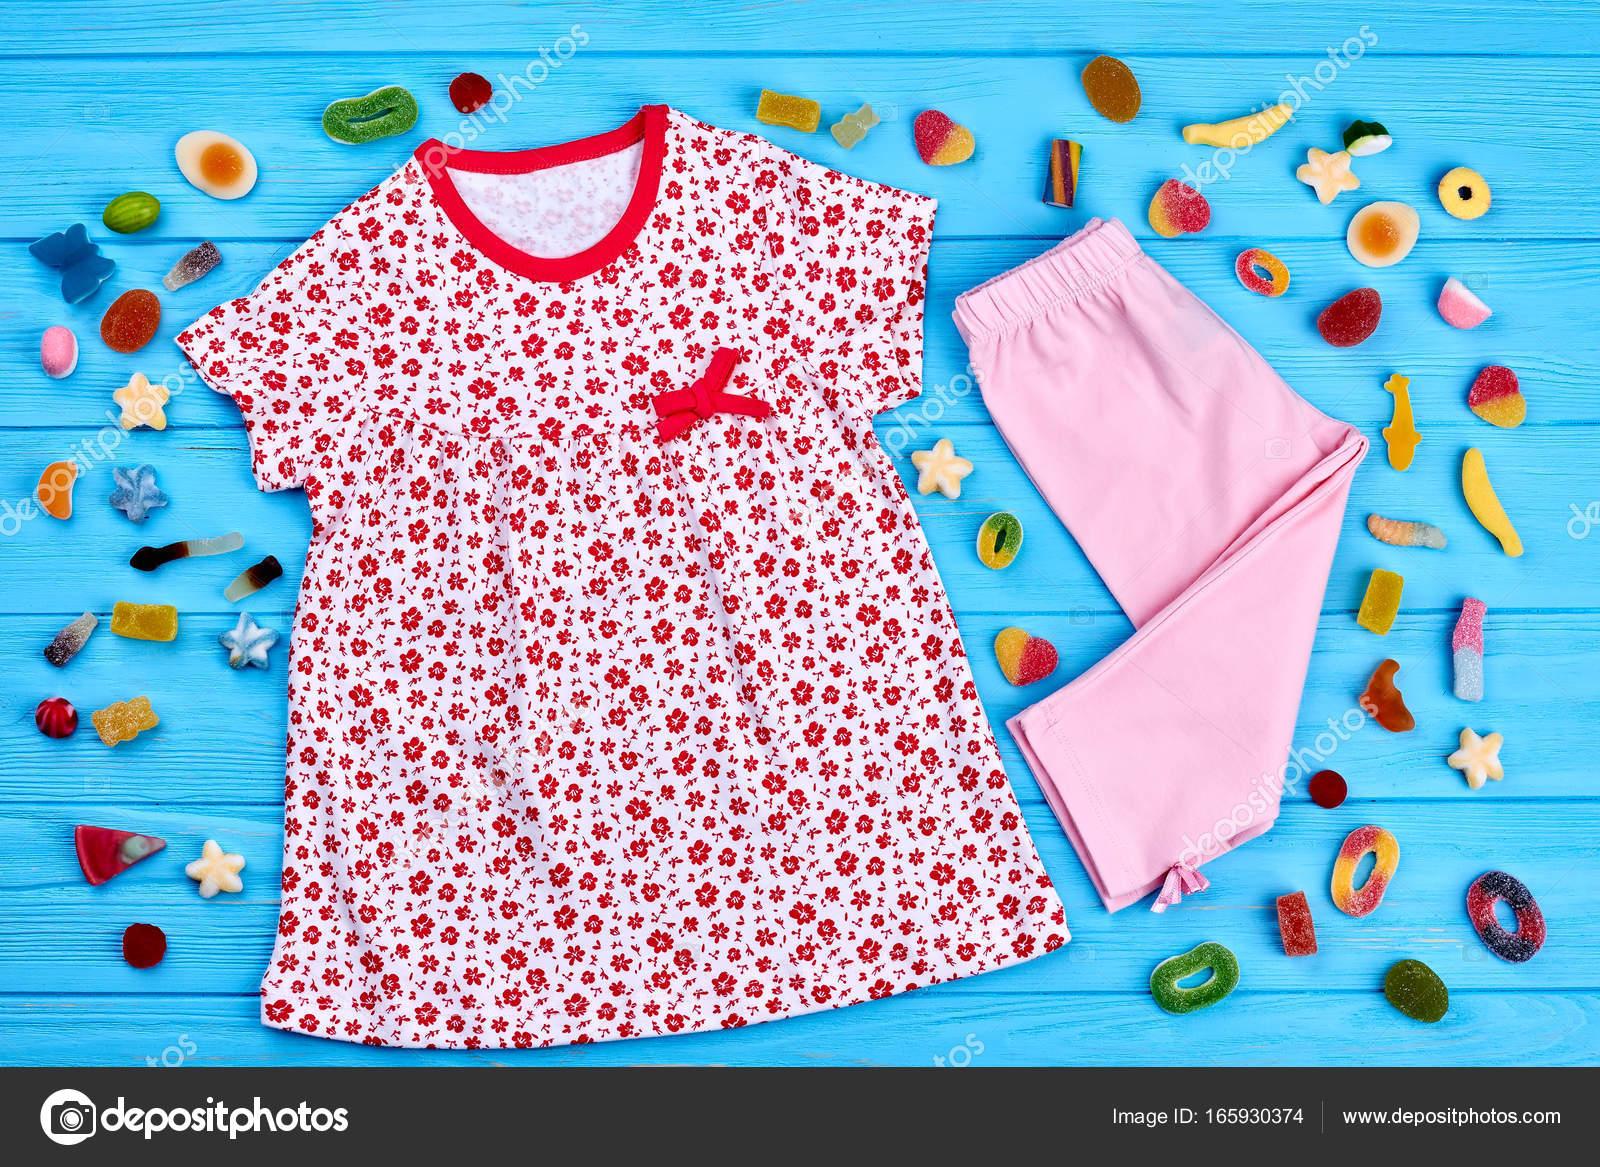 c1f185c18a Συλλογή από βρέφος κορίτσι καλοκαιρινό ρούχο. Φυσικό μάρκας καλοκαιρινά  ρούχα για Κοριτσάκια. Casual ένδυσης μωρό-κορίτσι καλοκαιρινό — Εικόνα από  Denisfilm